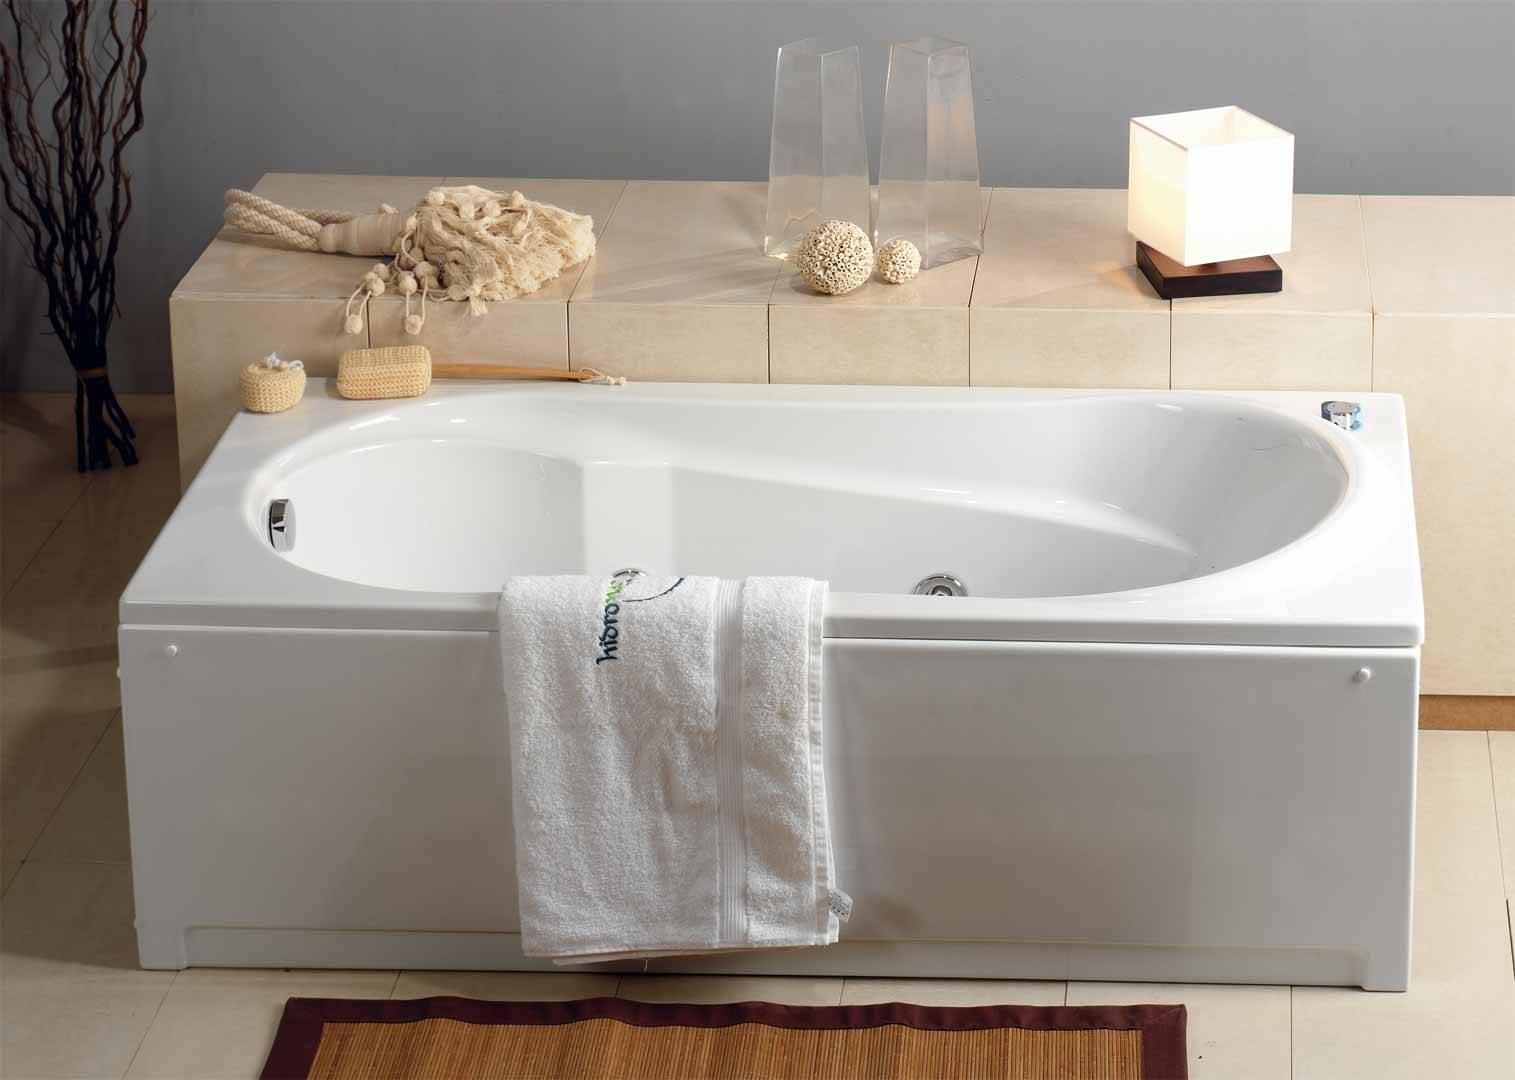 Arredobagno arredobagno pezzoni - Vasca da bagno corta ...